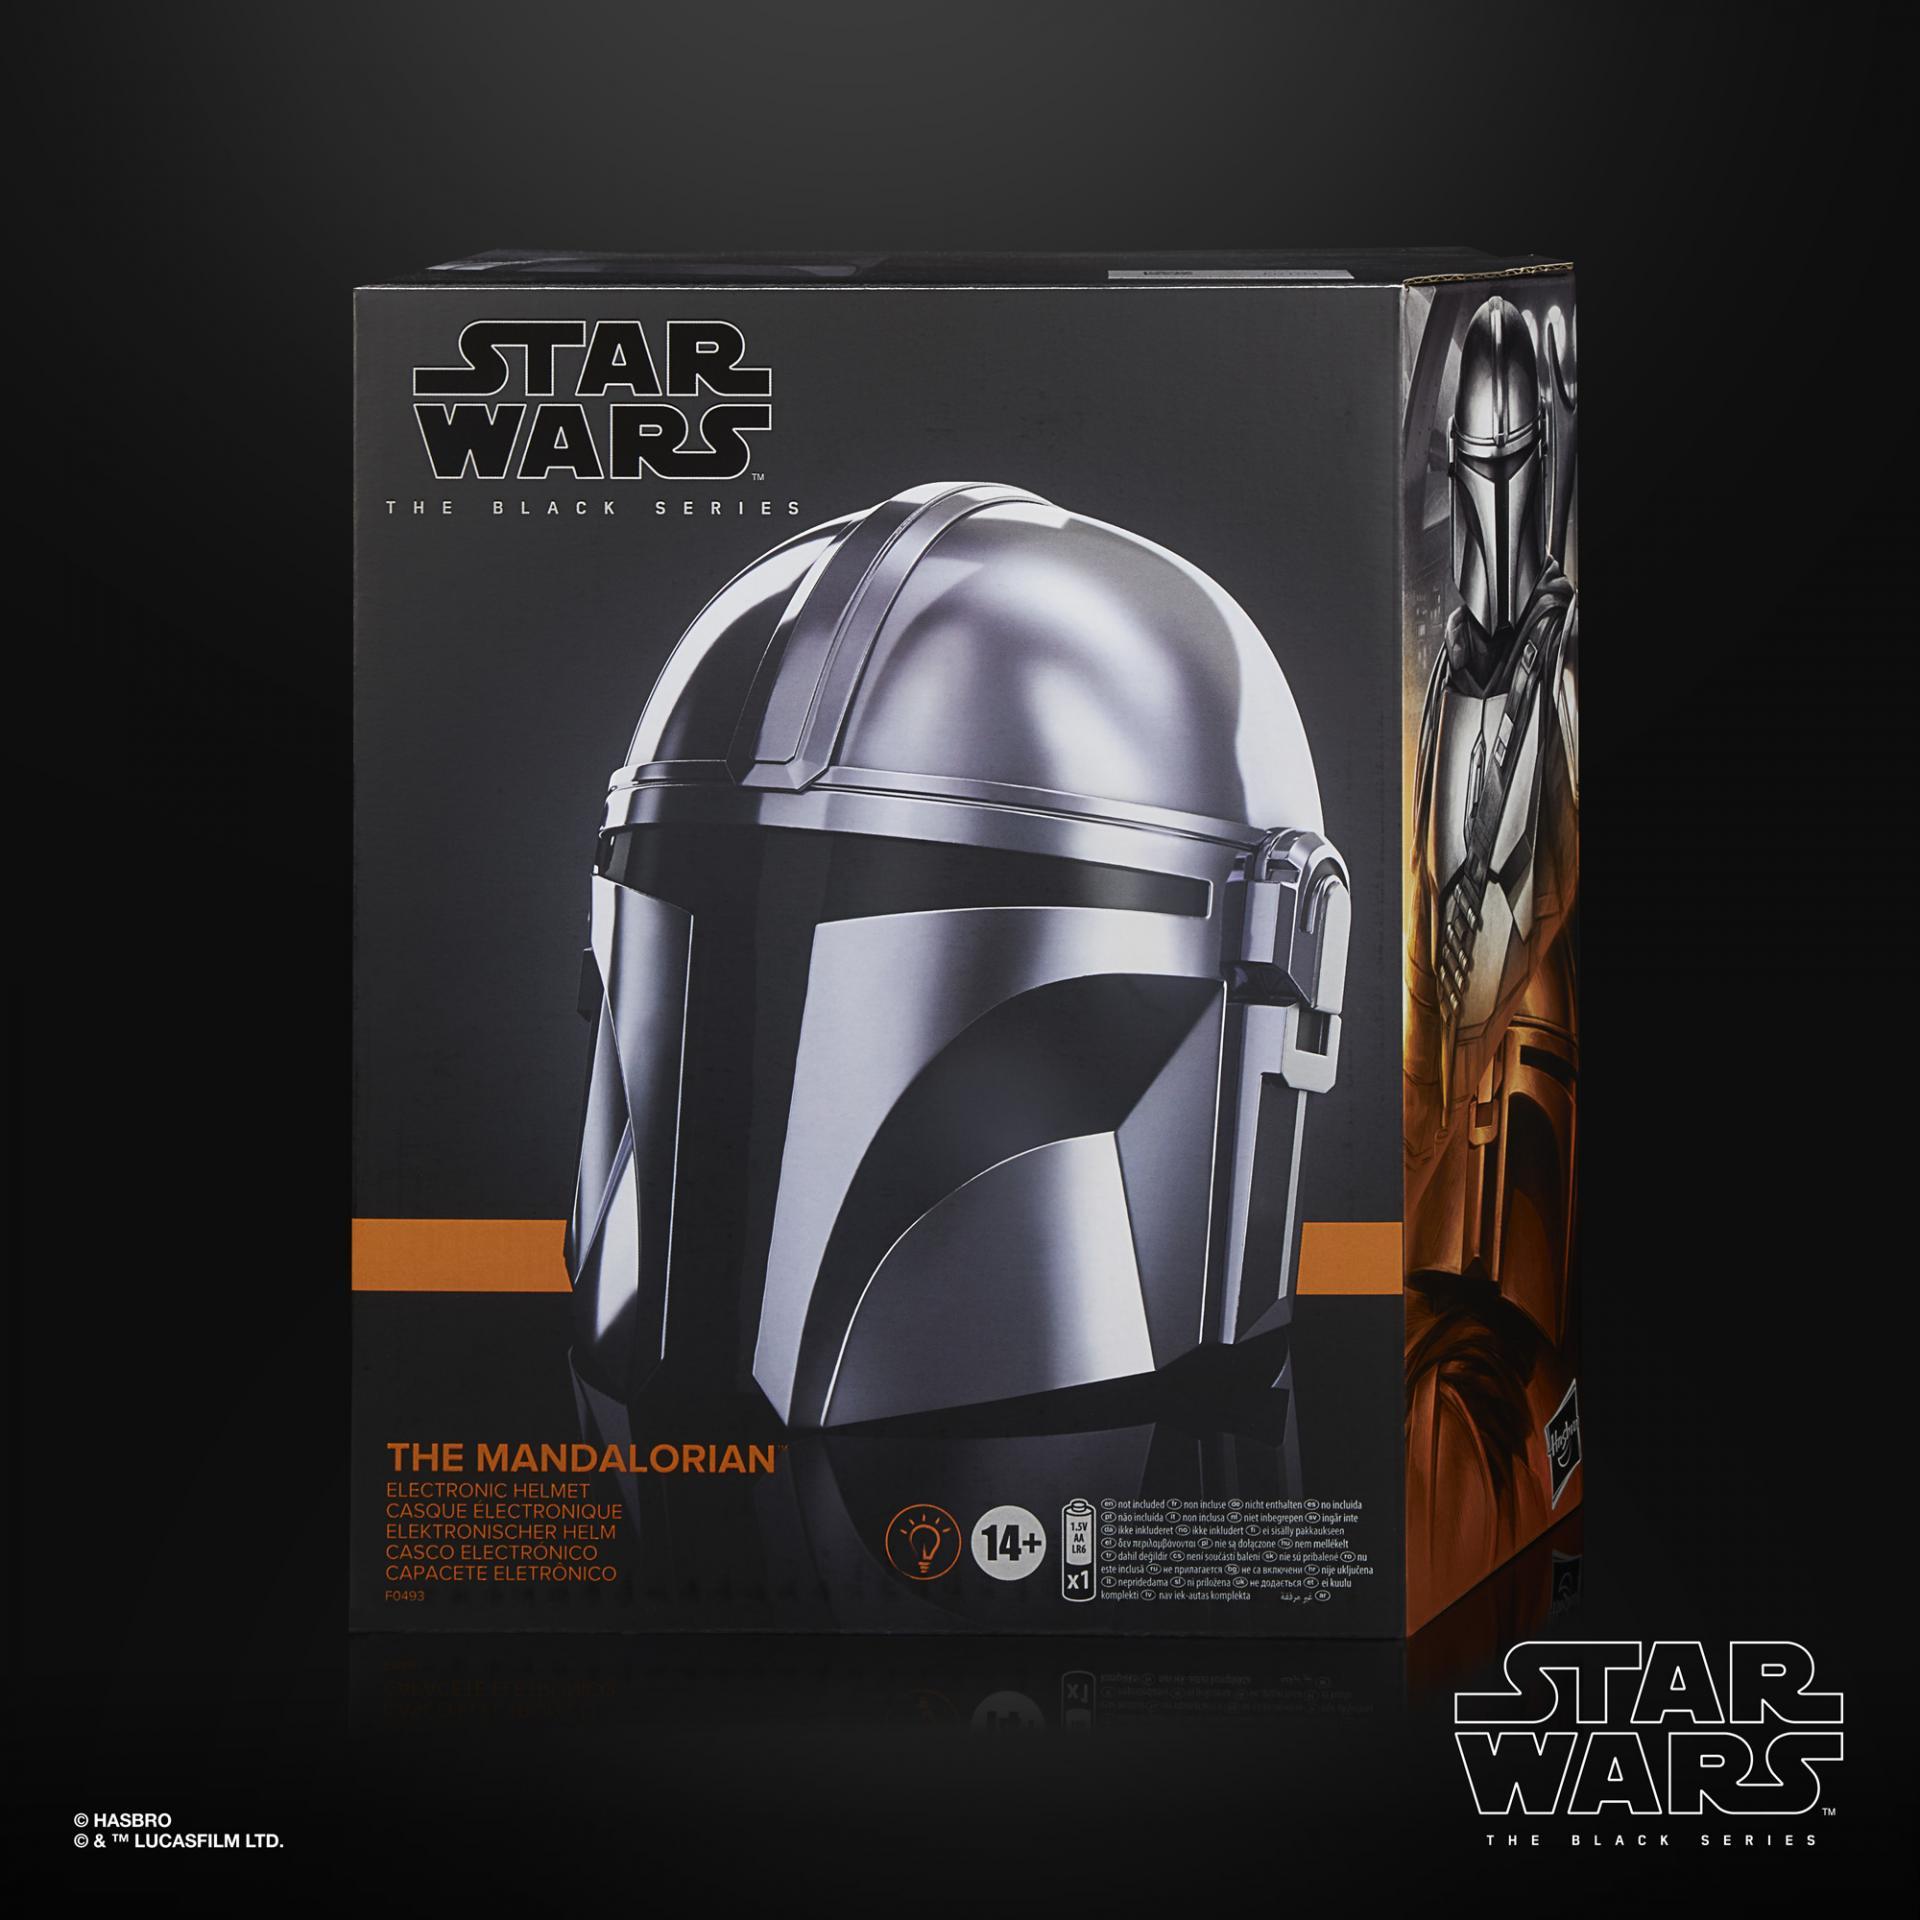 Star wars the black series the mandalorian electronic